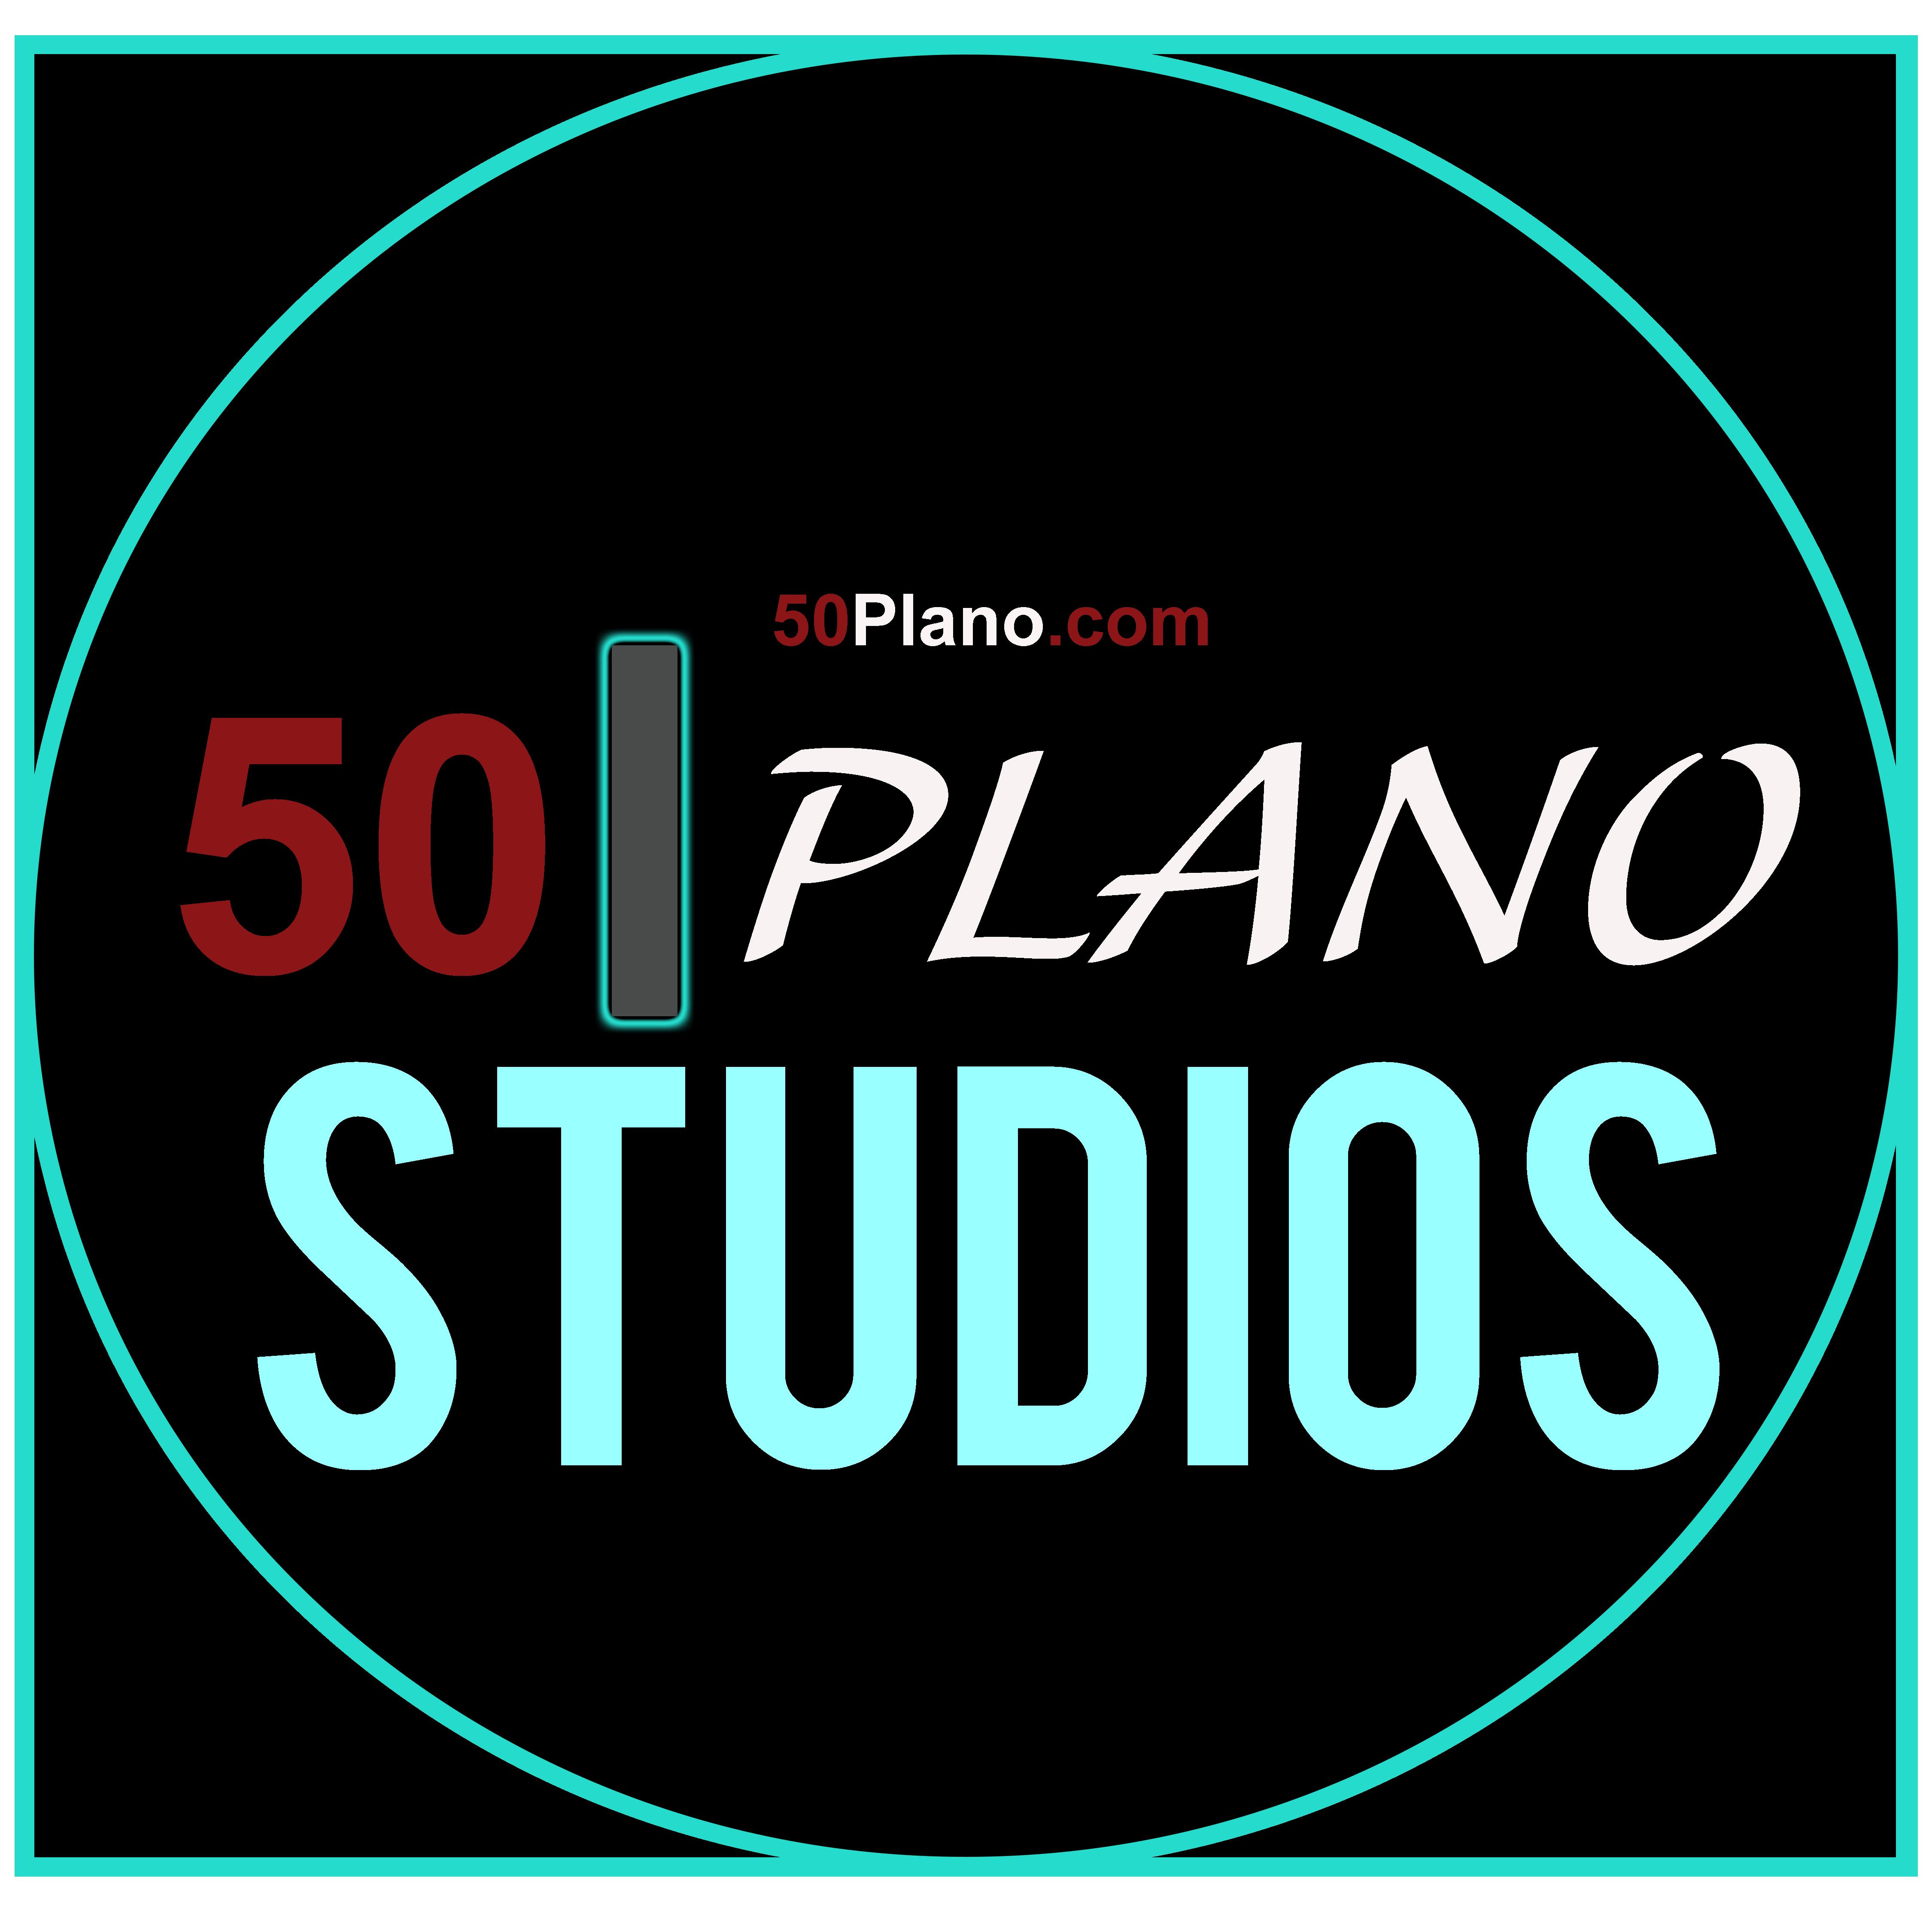 50plano studios logo png 2019